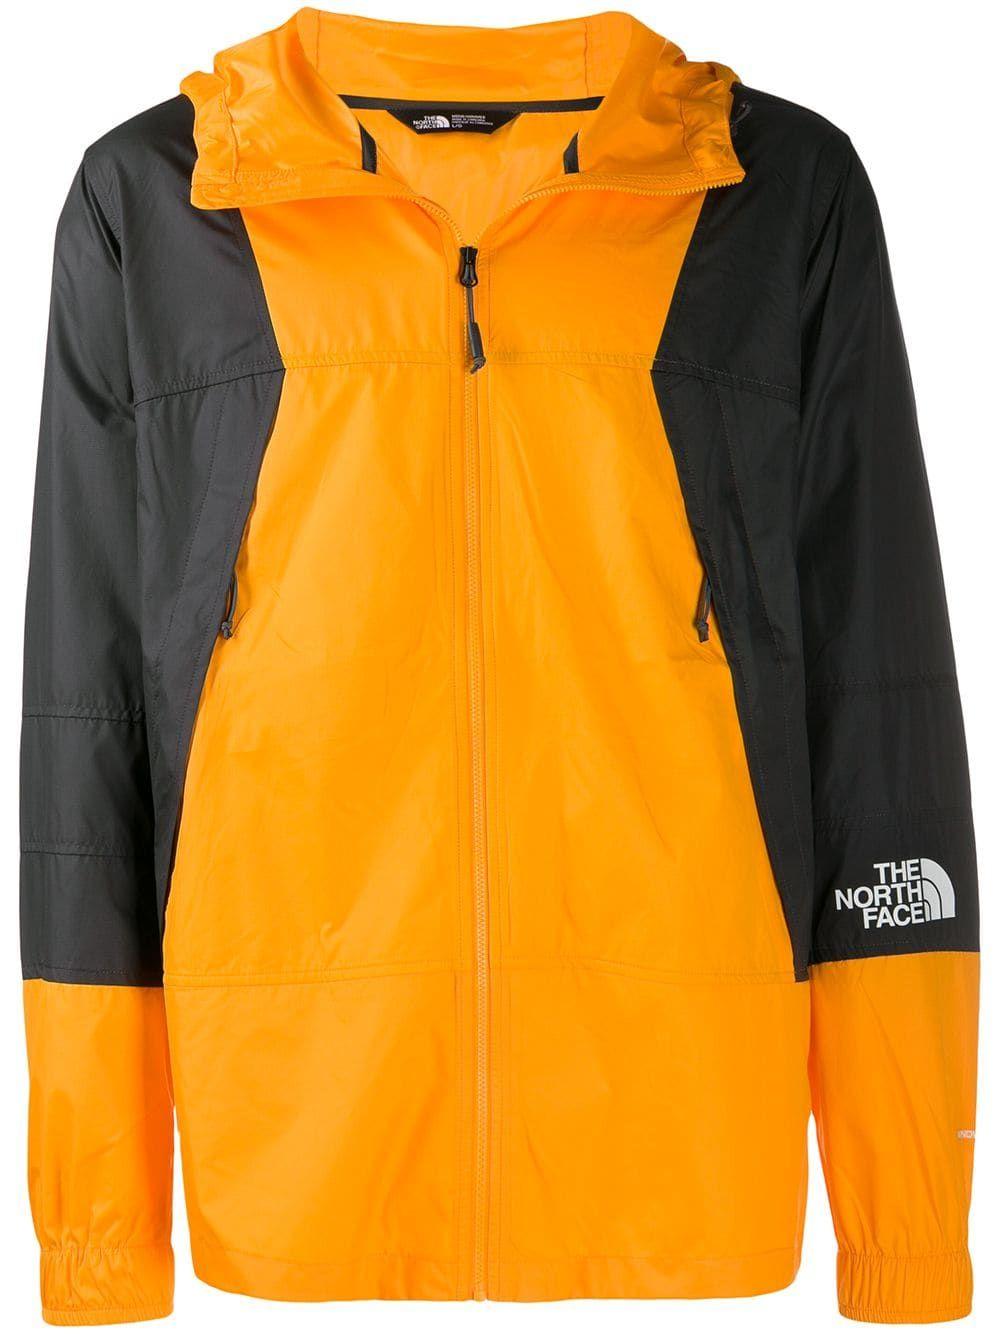 The North Face The North Face Two Tone Rain Jacket Orange Thenorthface Cloth Rain Jacket Black North Face The North Face [ 1334 x 1000 Pixel ]